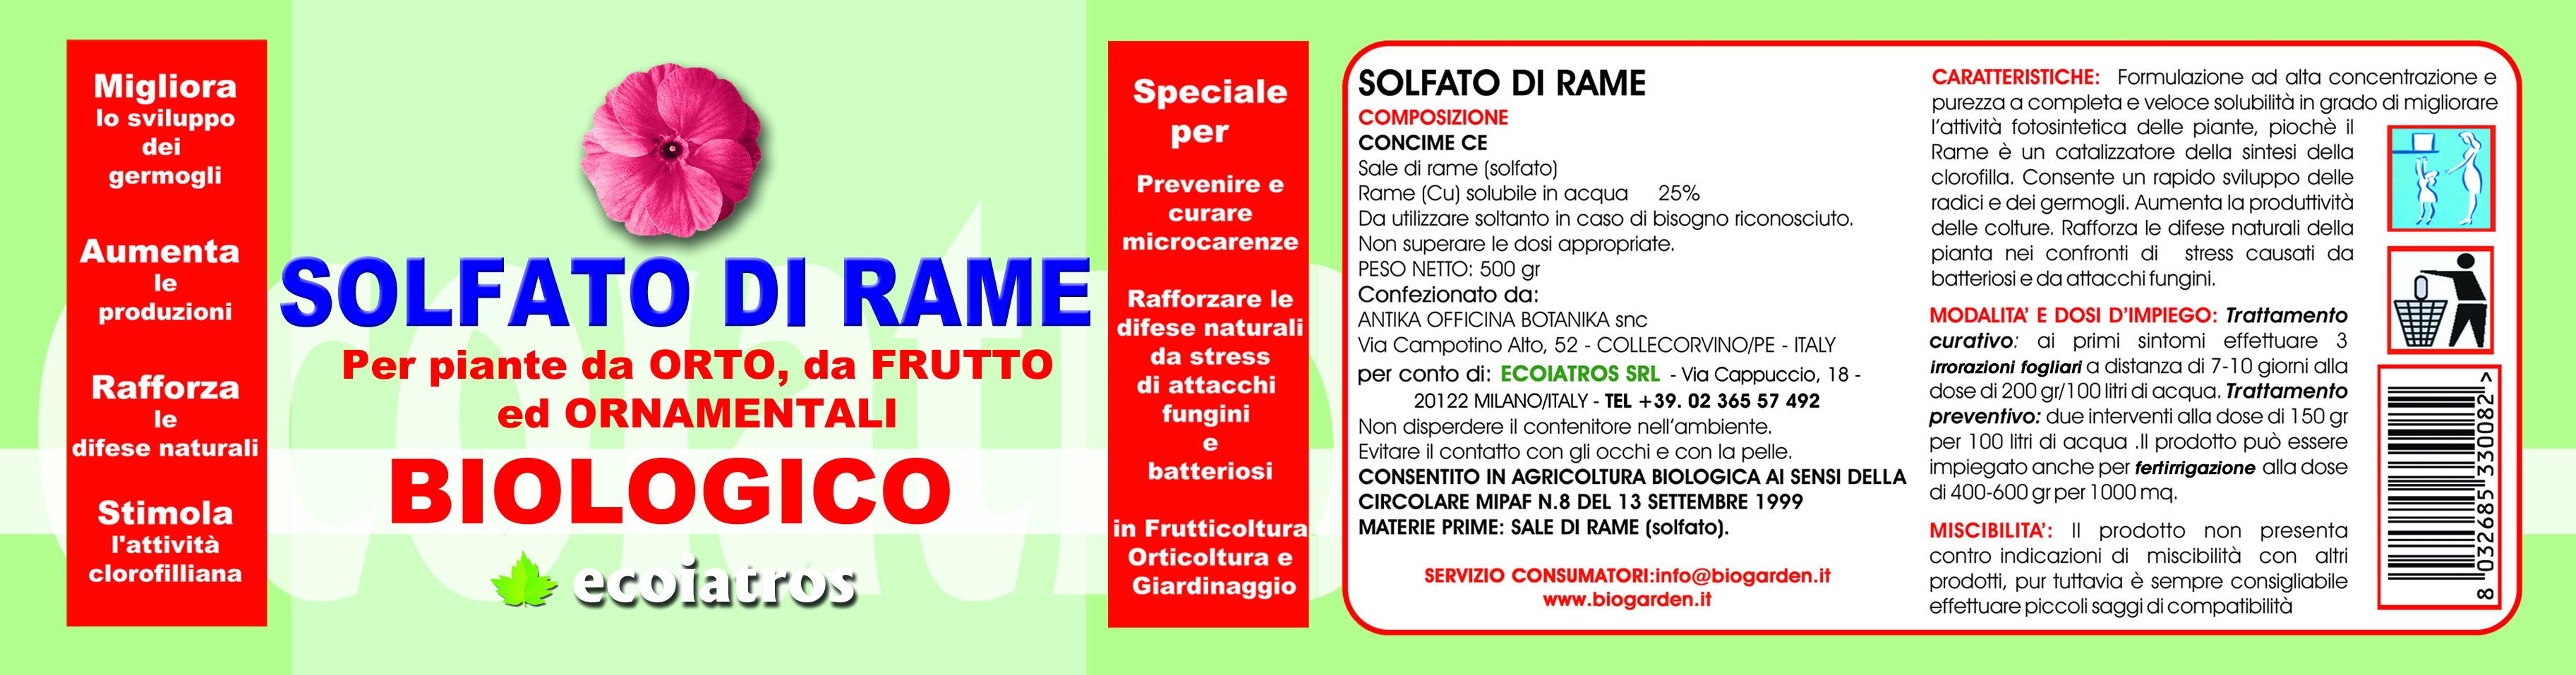 Solrame040506eco (50660 Byte)